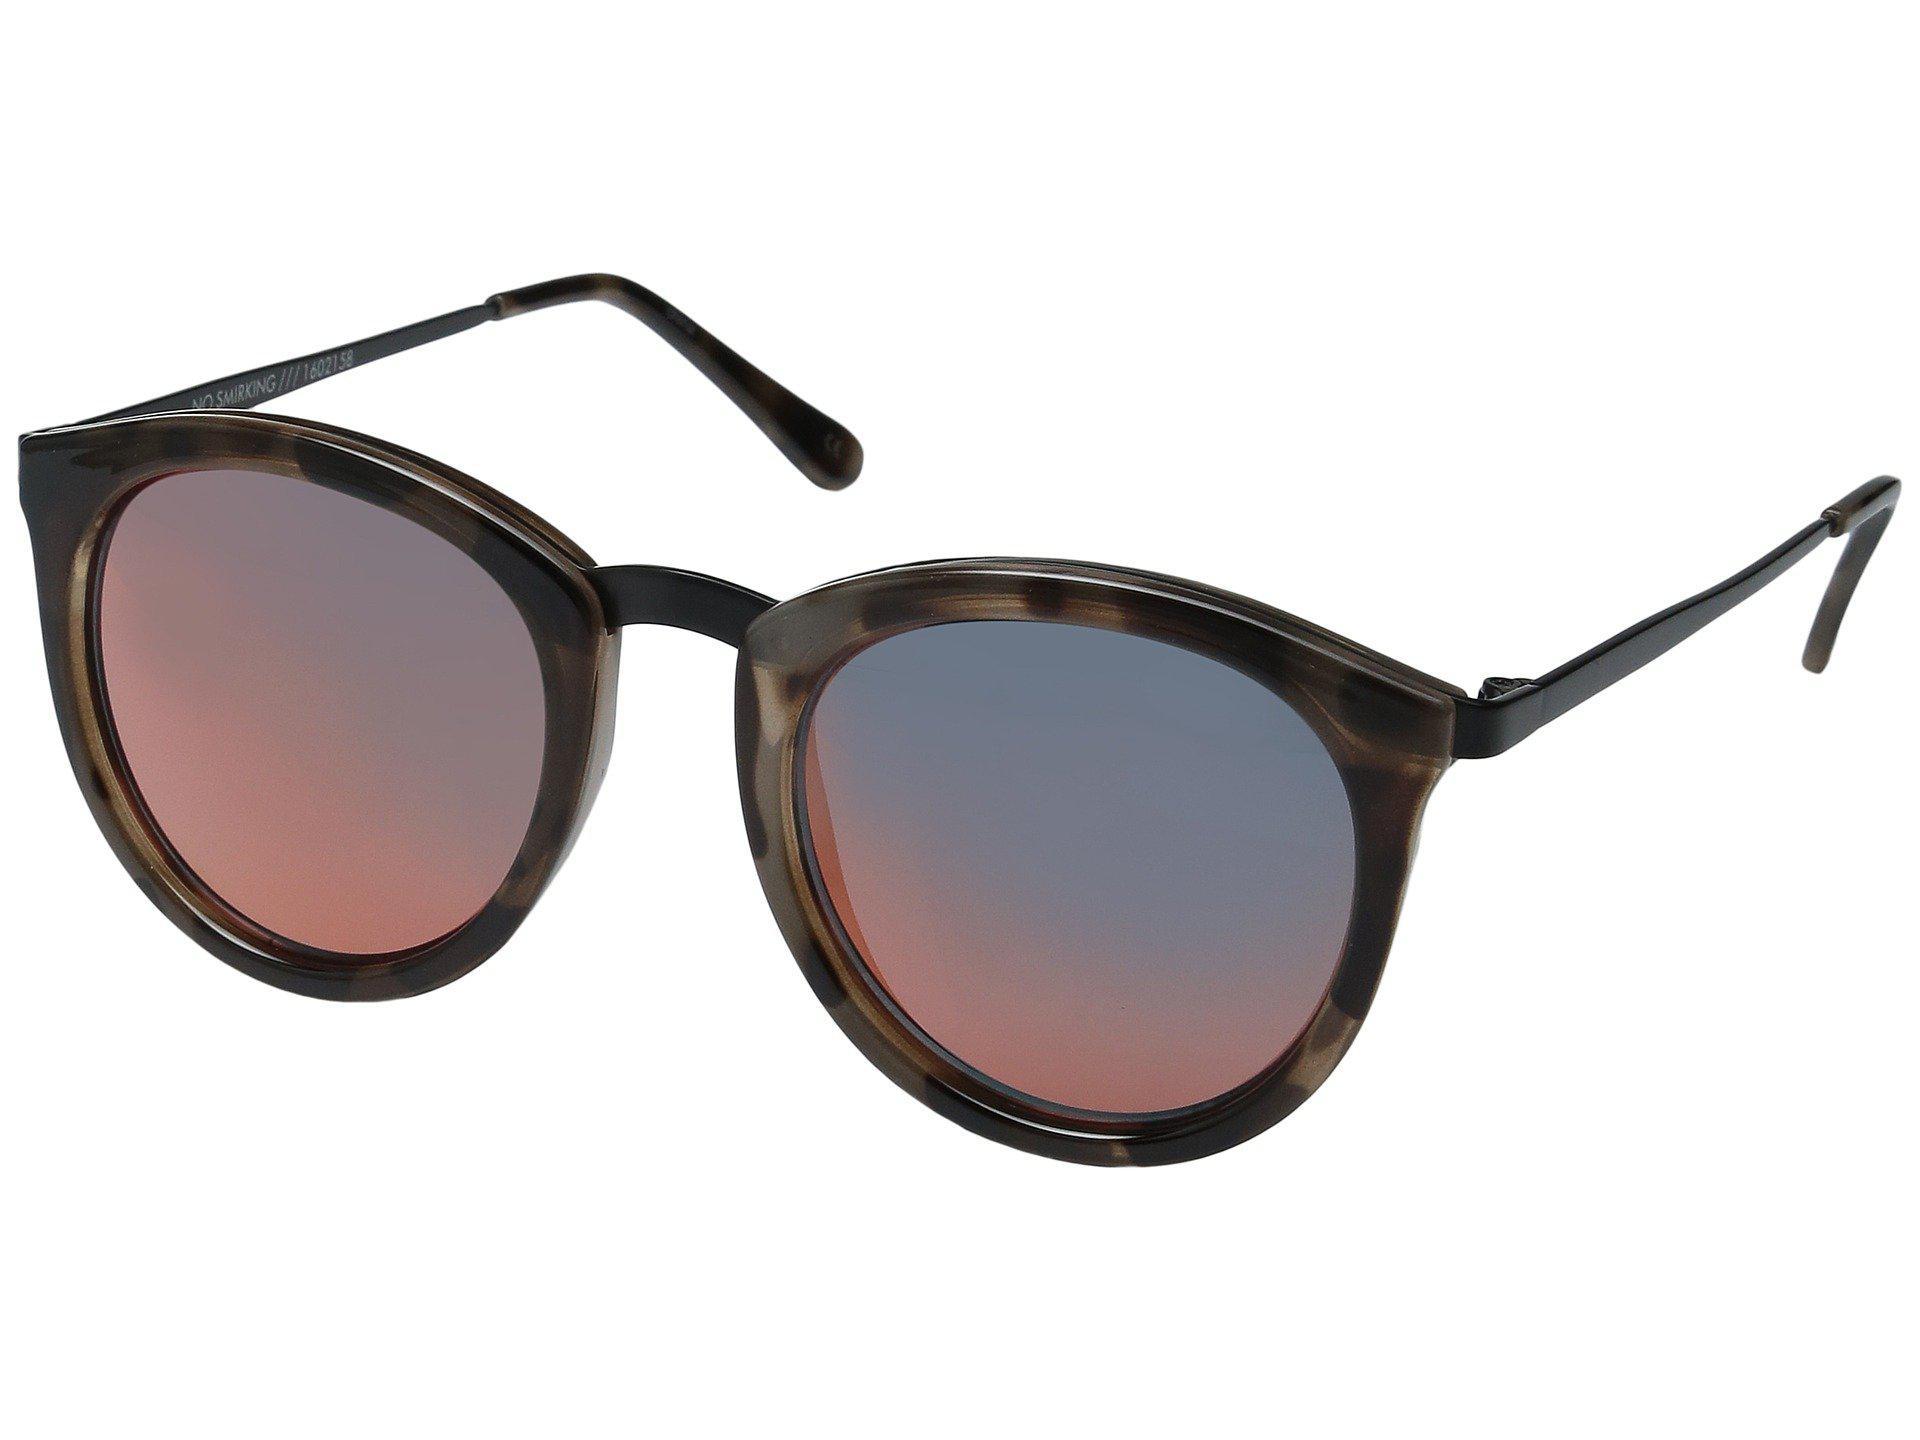 44f9b38168 Lyst - Le Specs No Smirking in Black